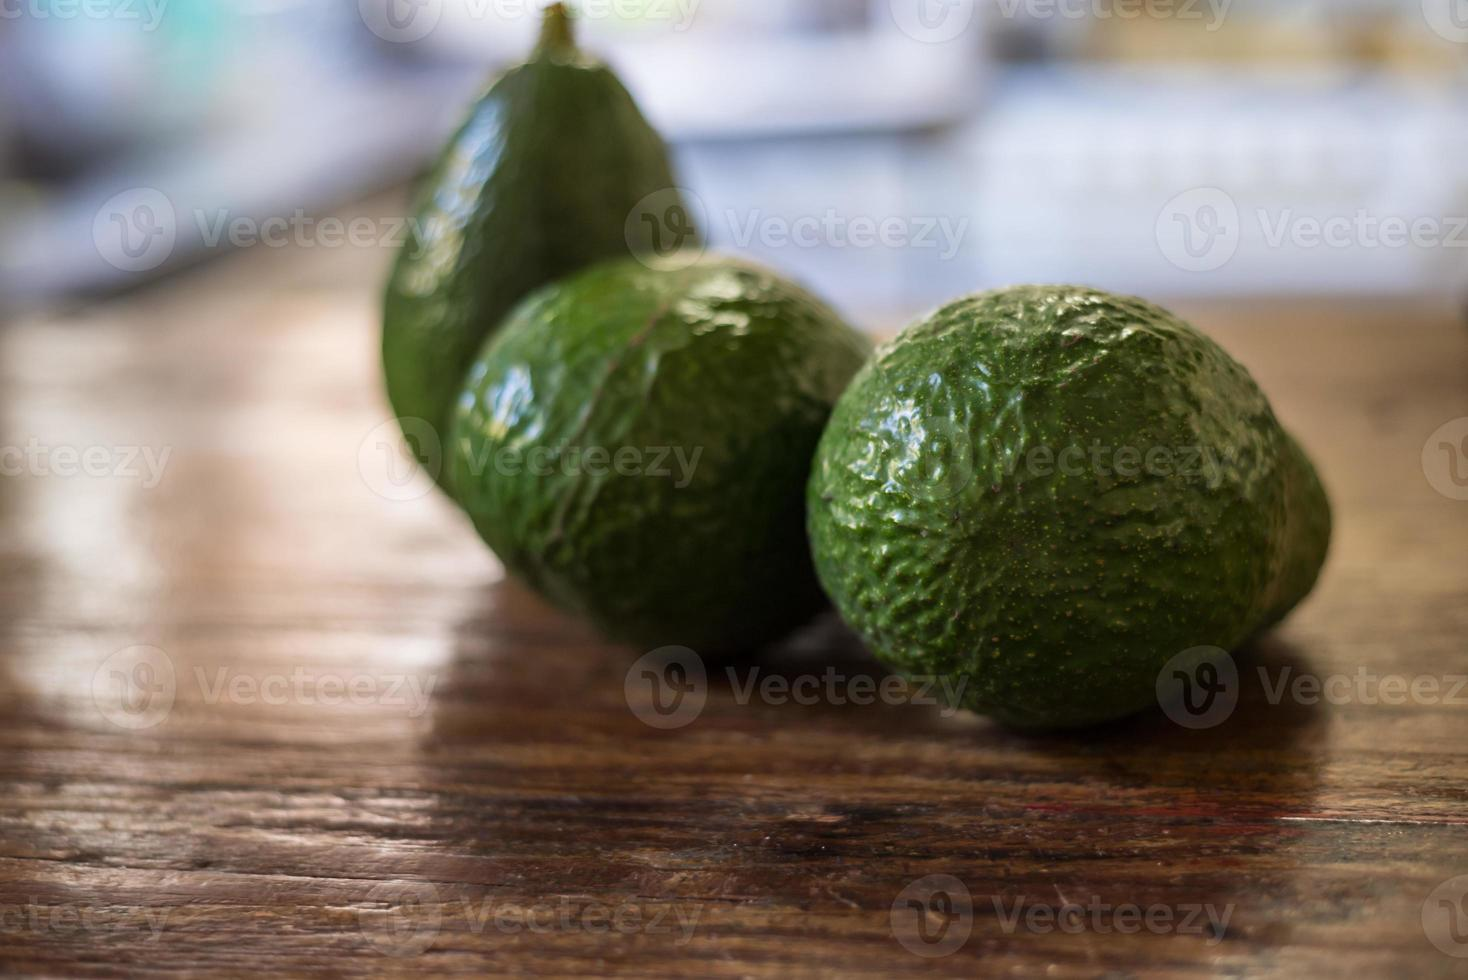 gustoso avocado, cibo tropicale crudo. foto